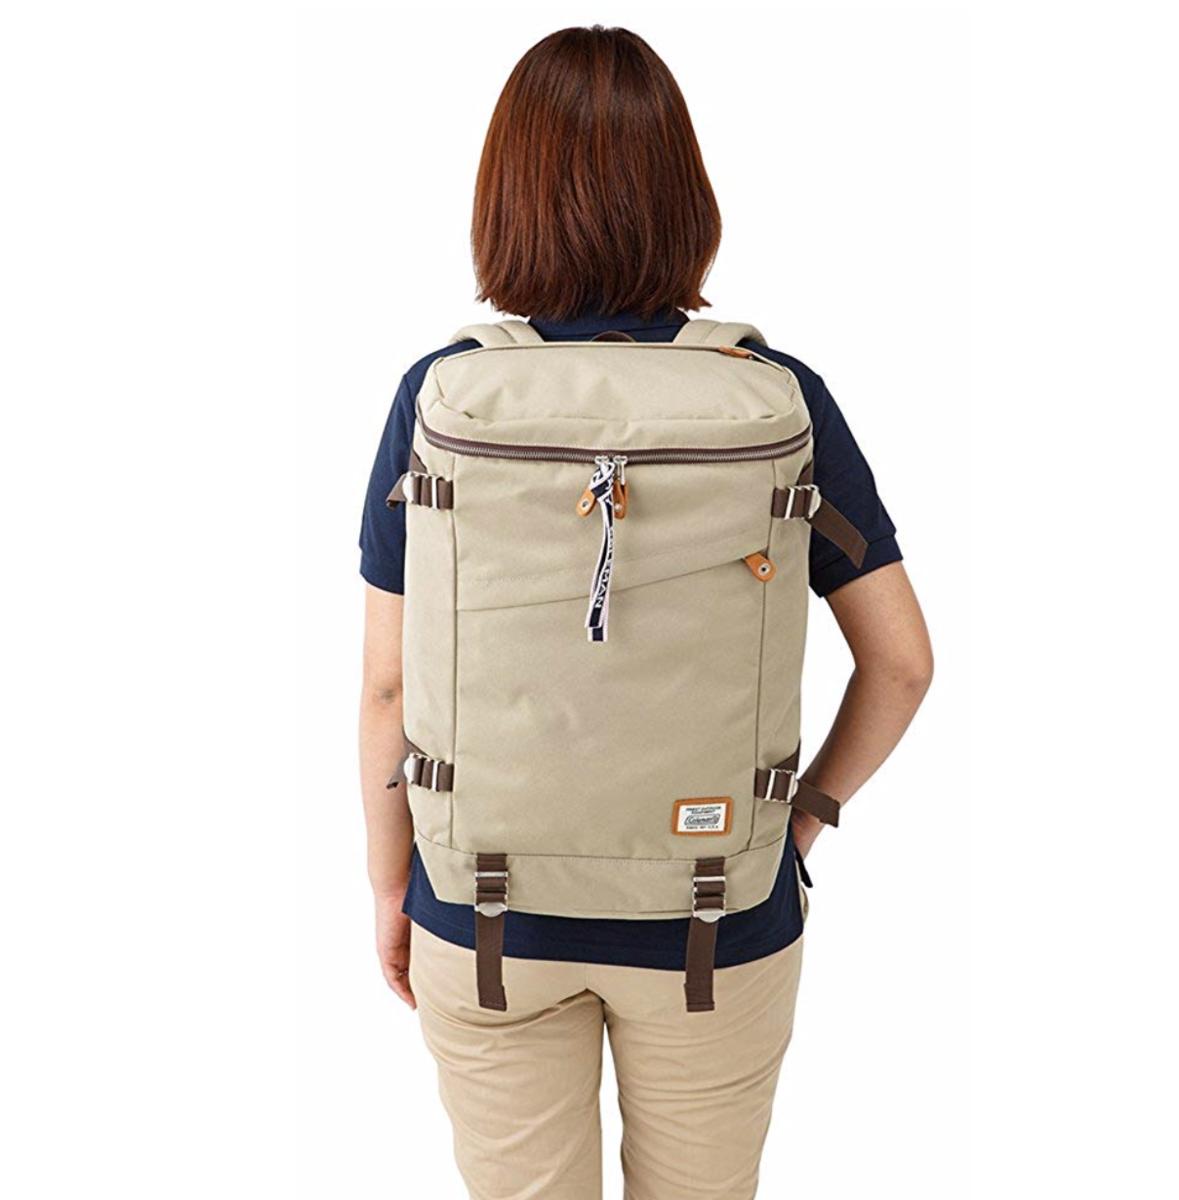 f:id:thebackpack:20190416181609p:plain